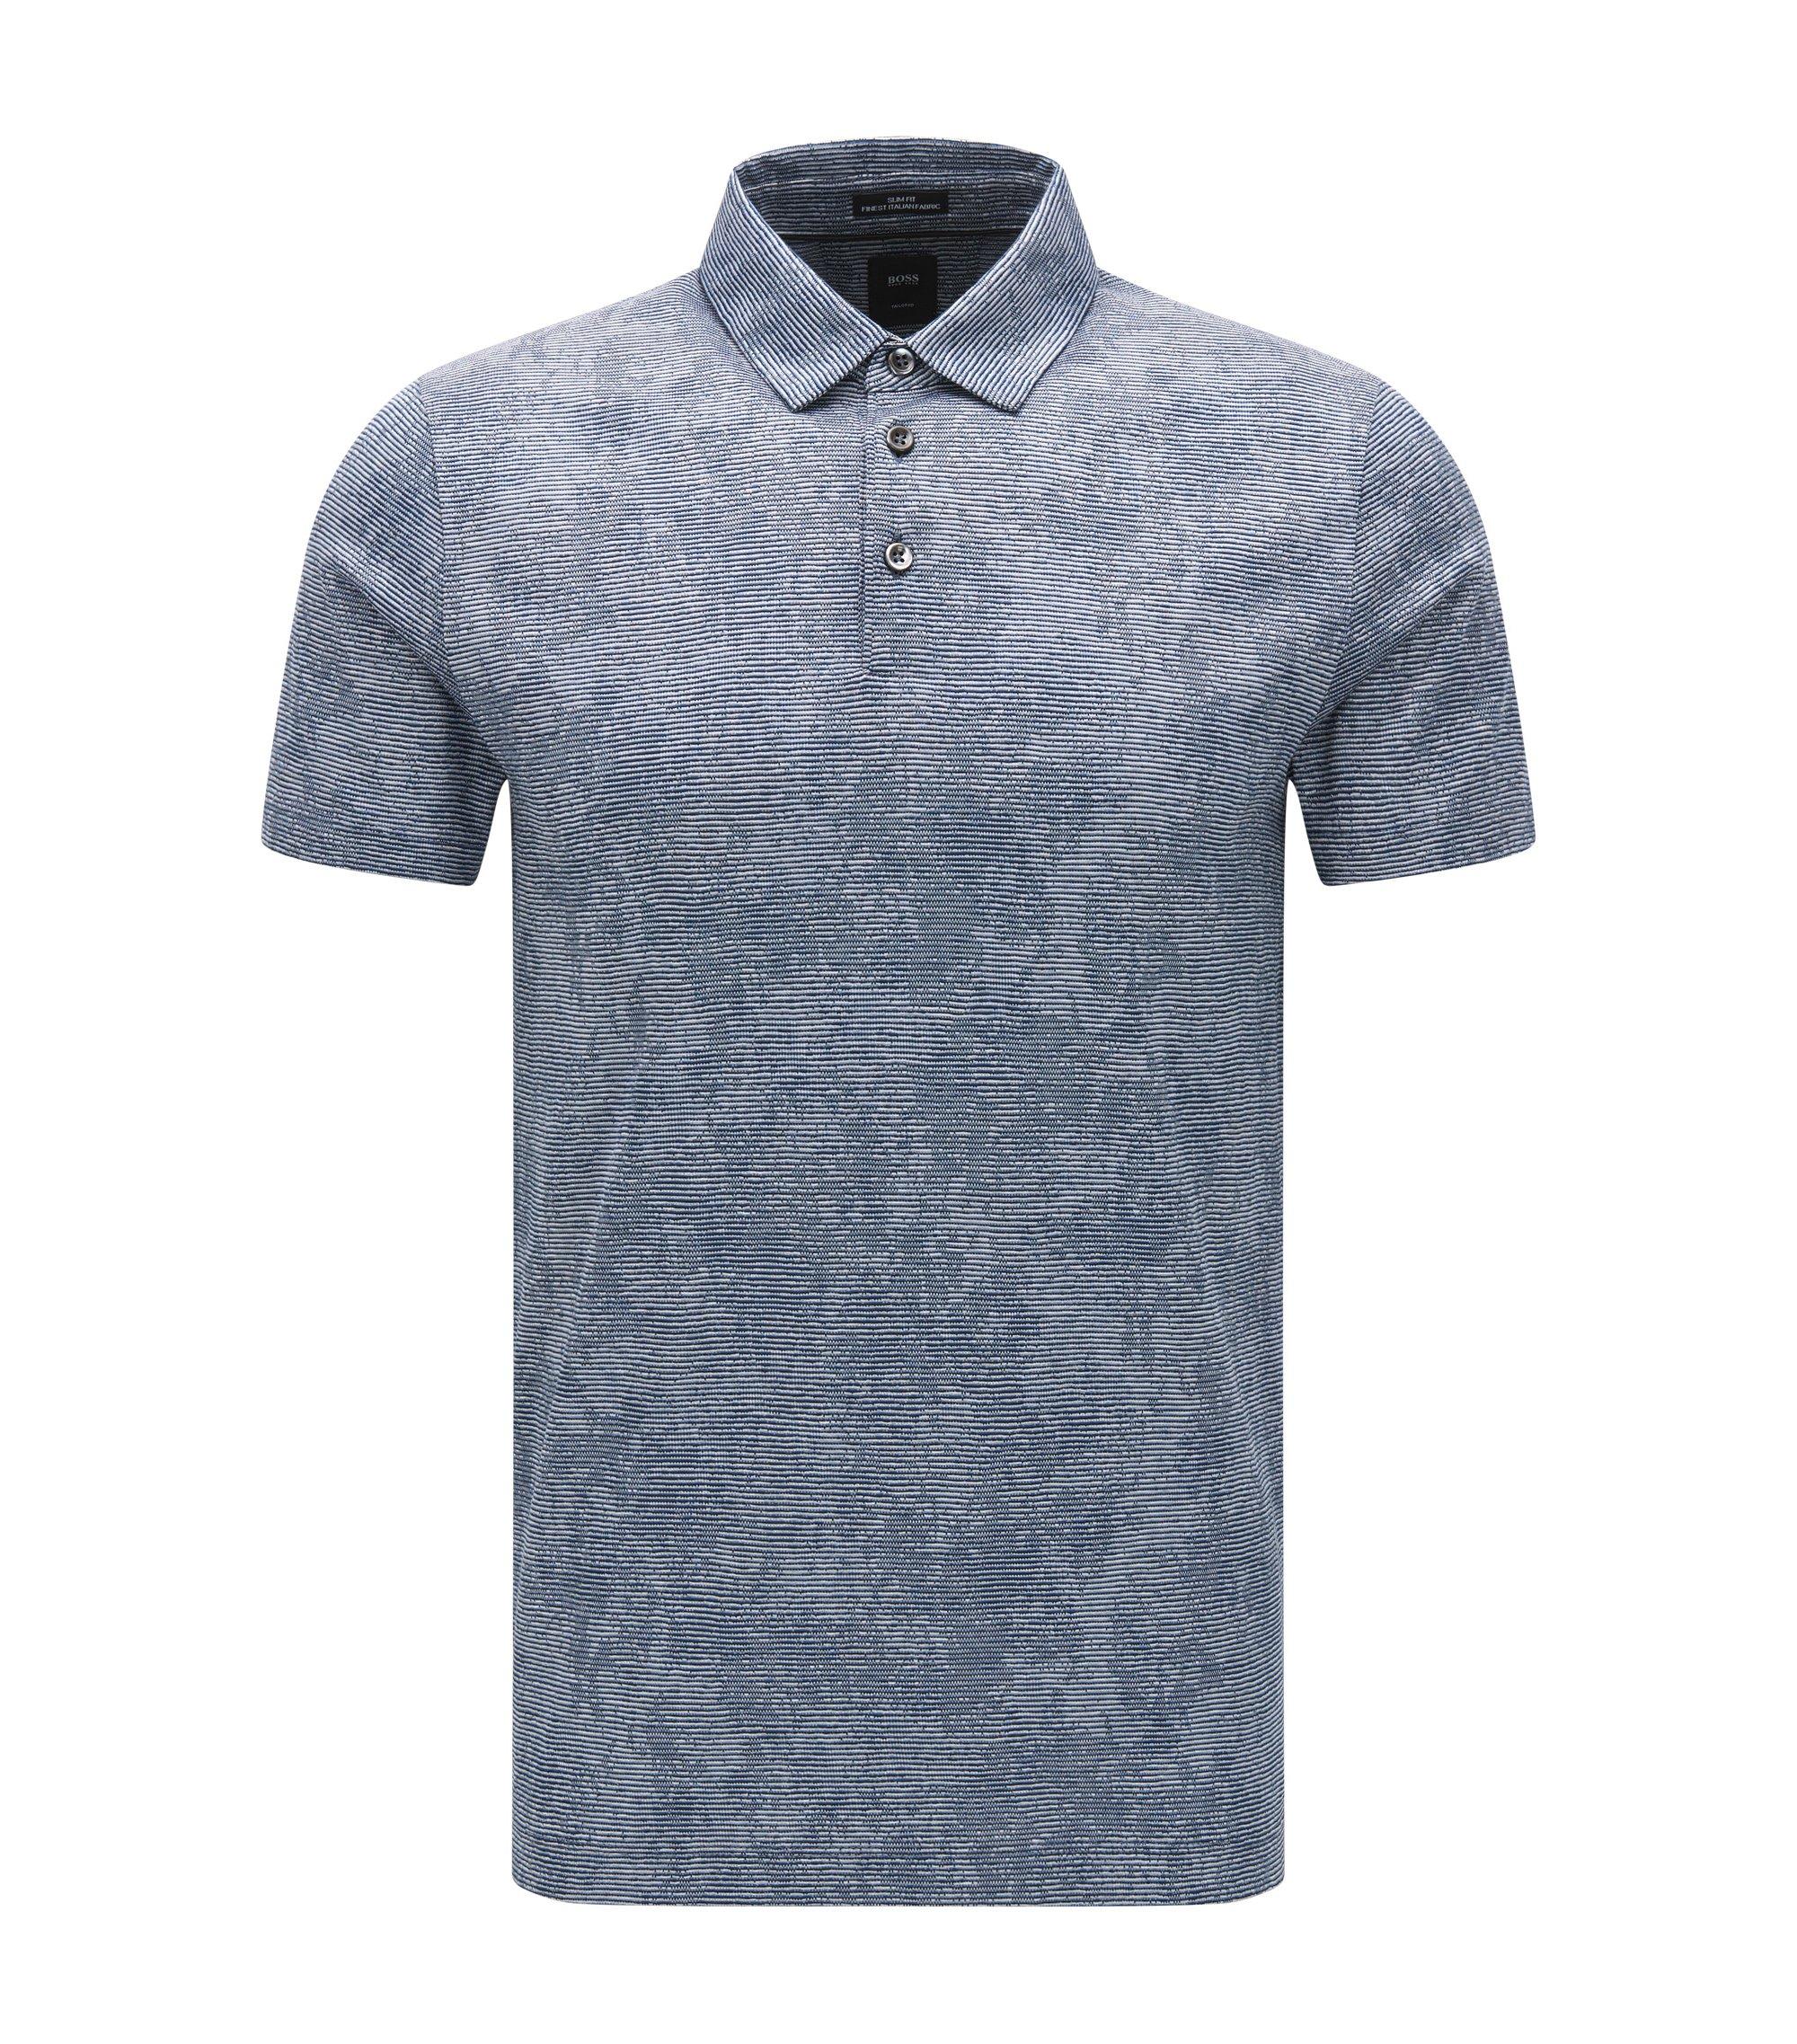 Polo Slim Fit en coton au motif jacquard, Bleu foncé